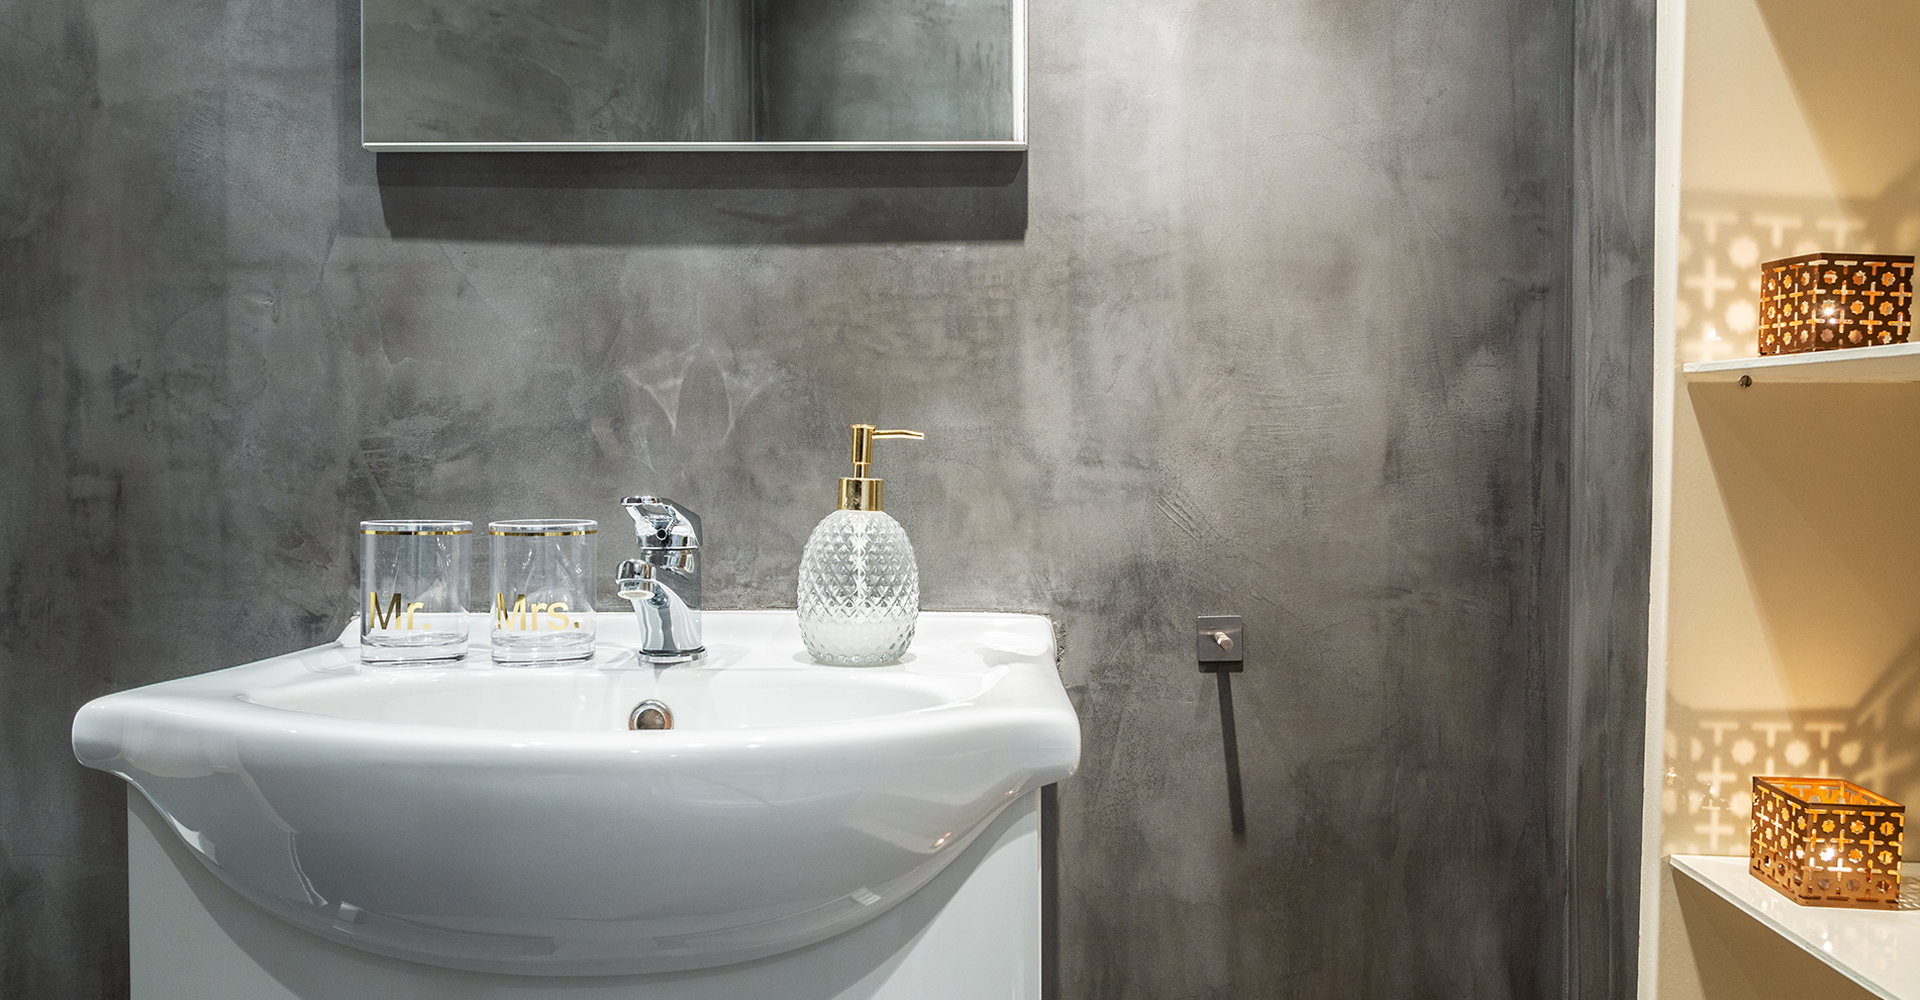 Beton cire wand badkamer